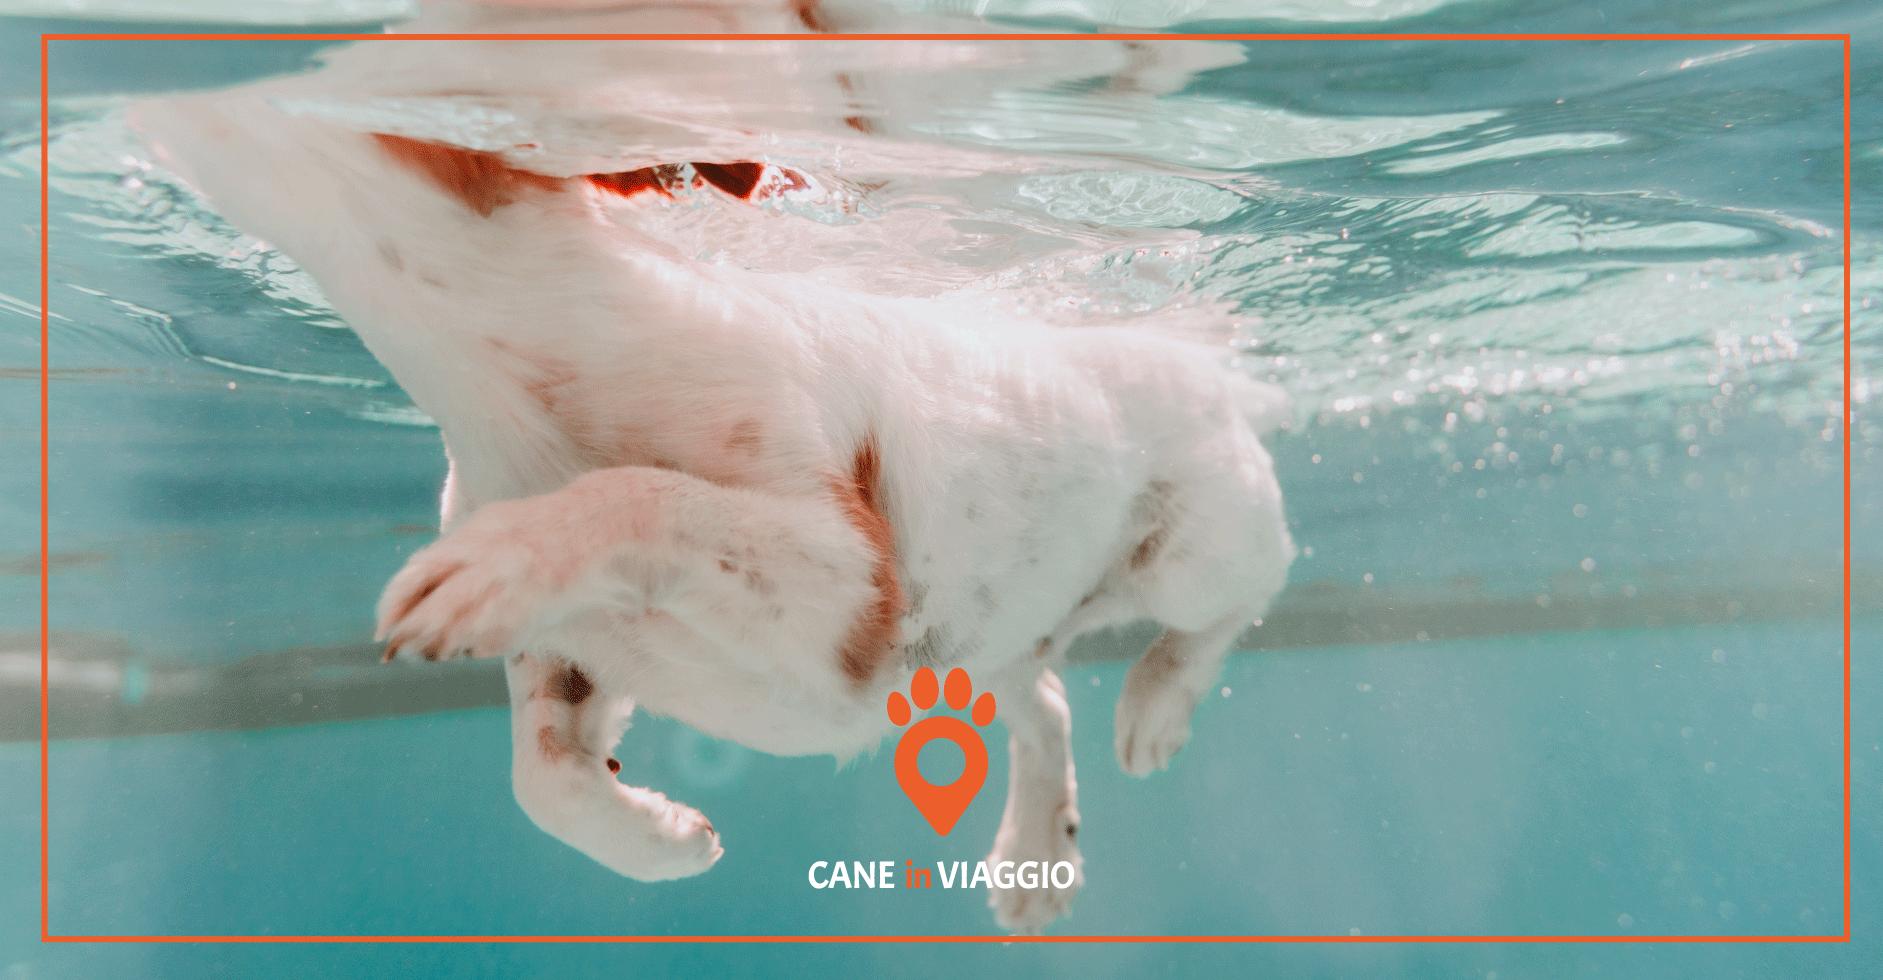 cane_piscina_Milano